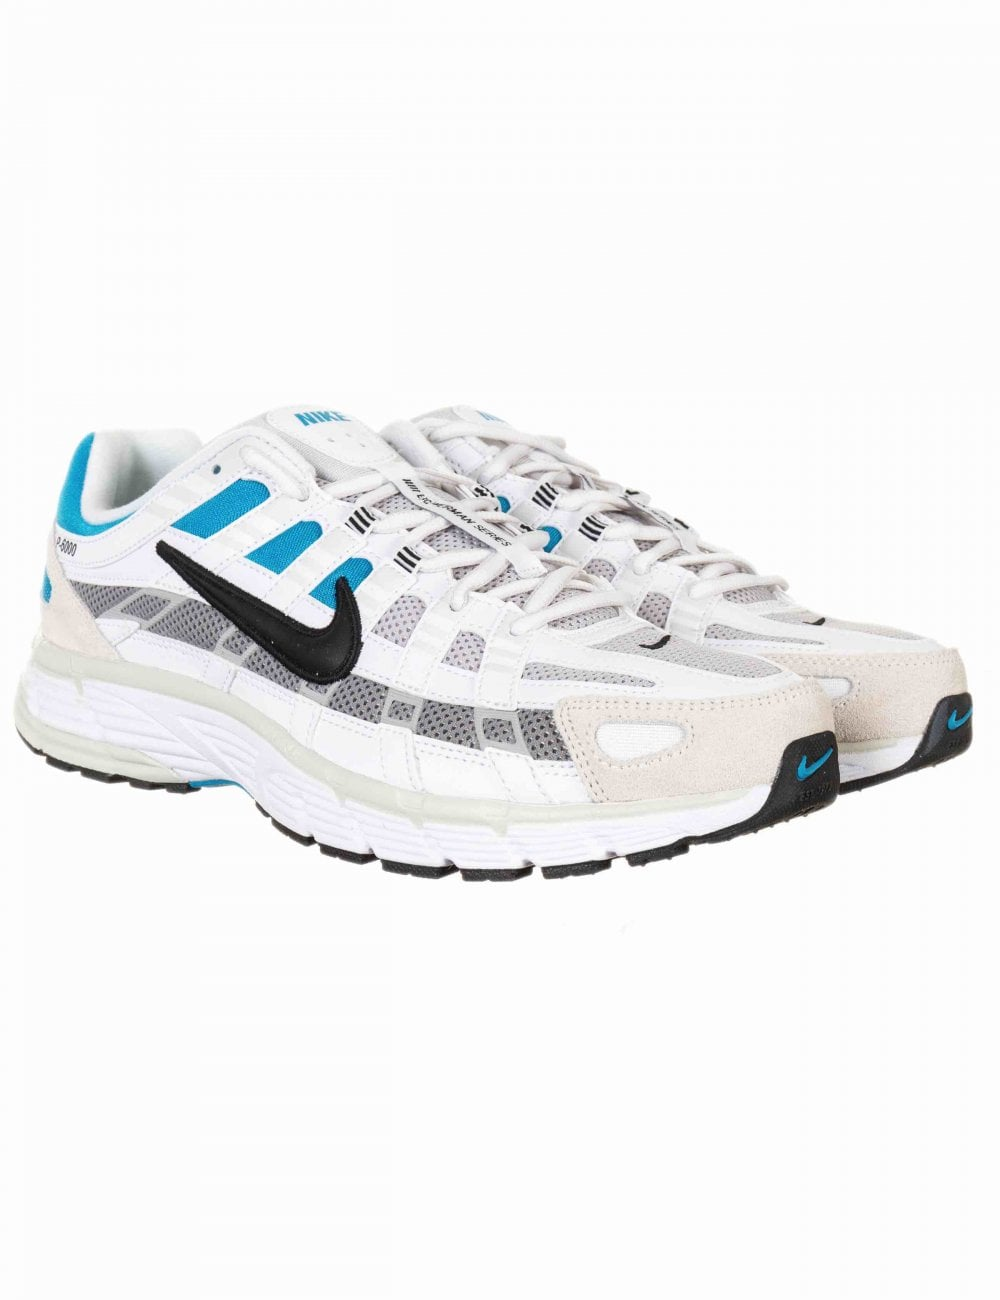 Nike P-6000 Trainers - White/Blue/Black